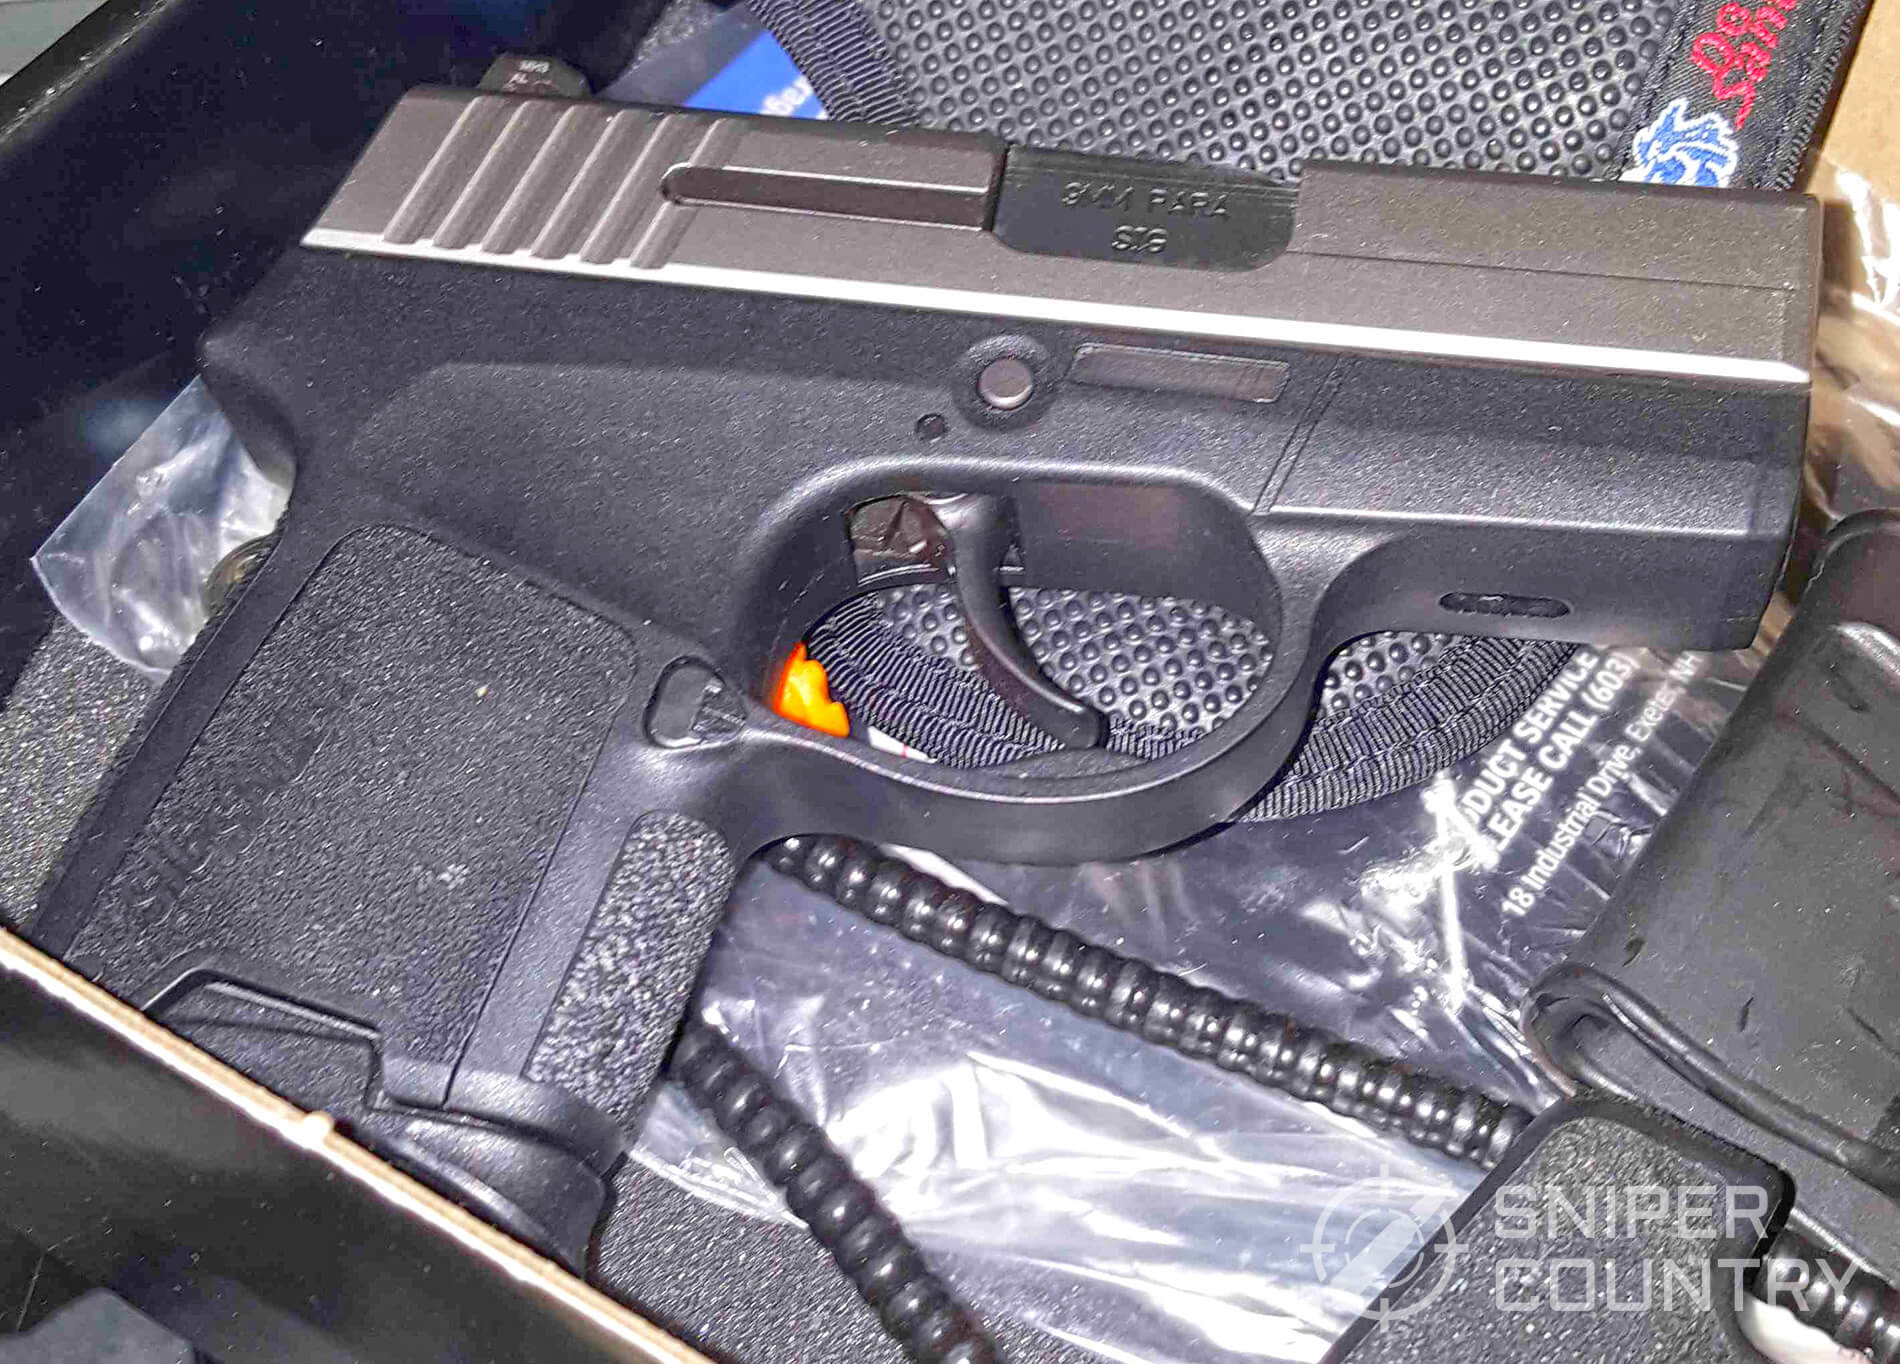 Best 9mm Handguns [Sub-Compact, Compact, Full-Size] | Sniper